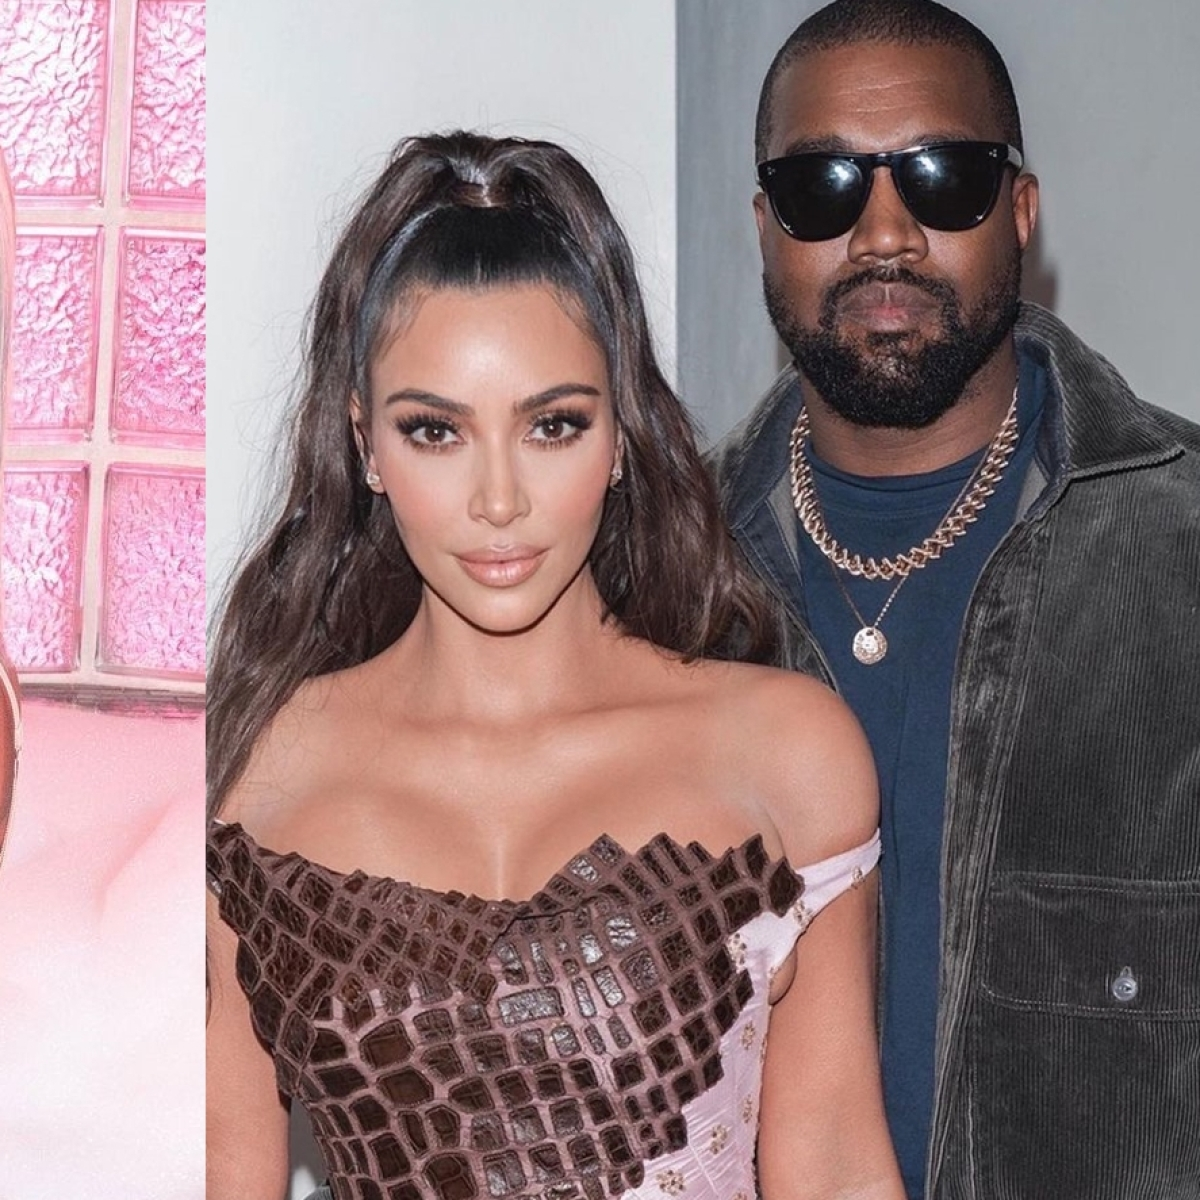 Is Kanye West dating beauty influencer Jeffree Star amid divorce from Kim Kardashian?